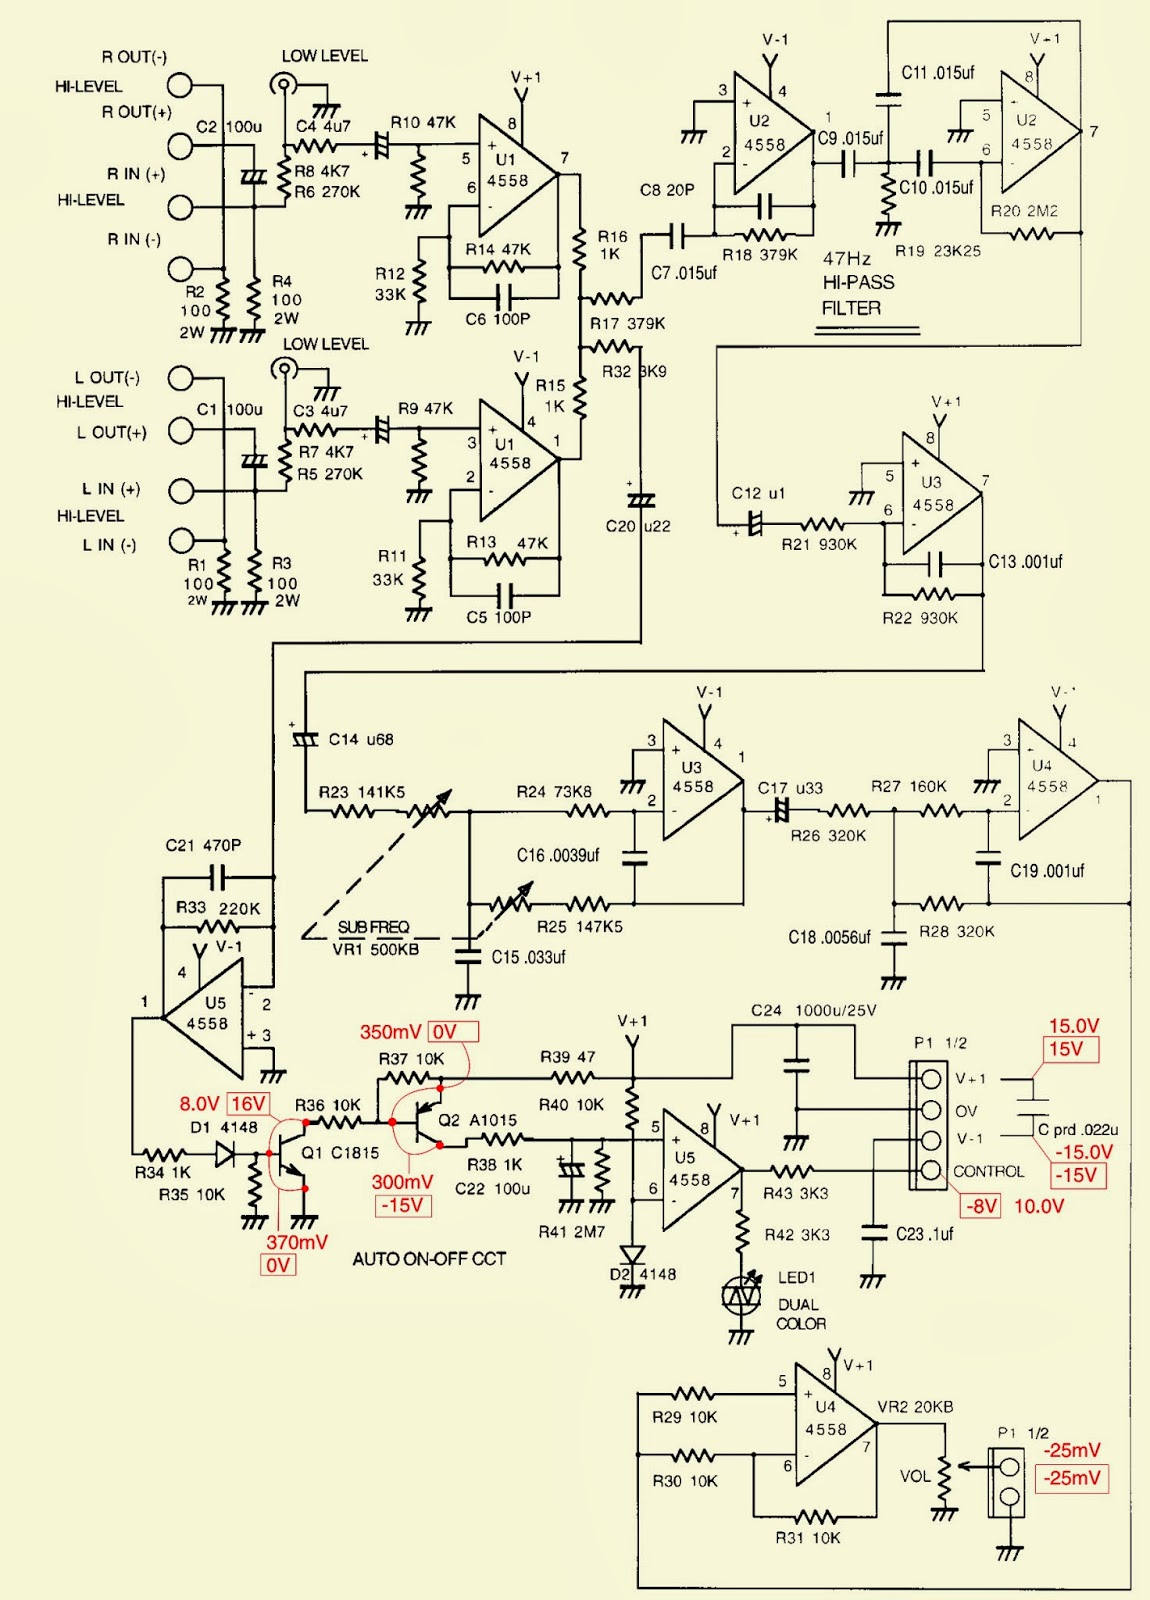 jbl arc sub test procedure schematic diagram circuit diagram jbl arc sub test procedure schematic diagram circuit diagram [ 1150 x 1600 Pixel ]